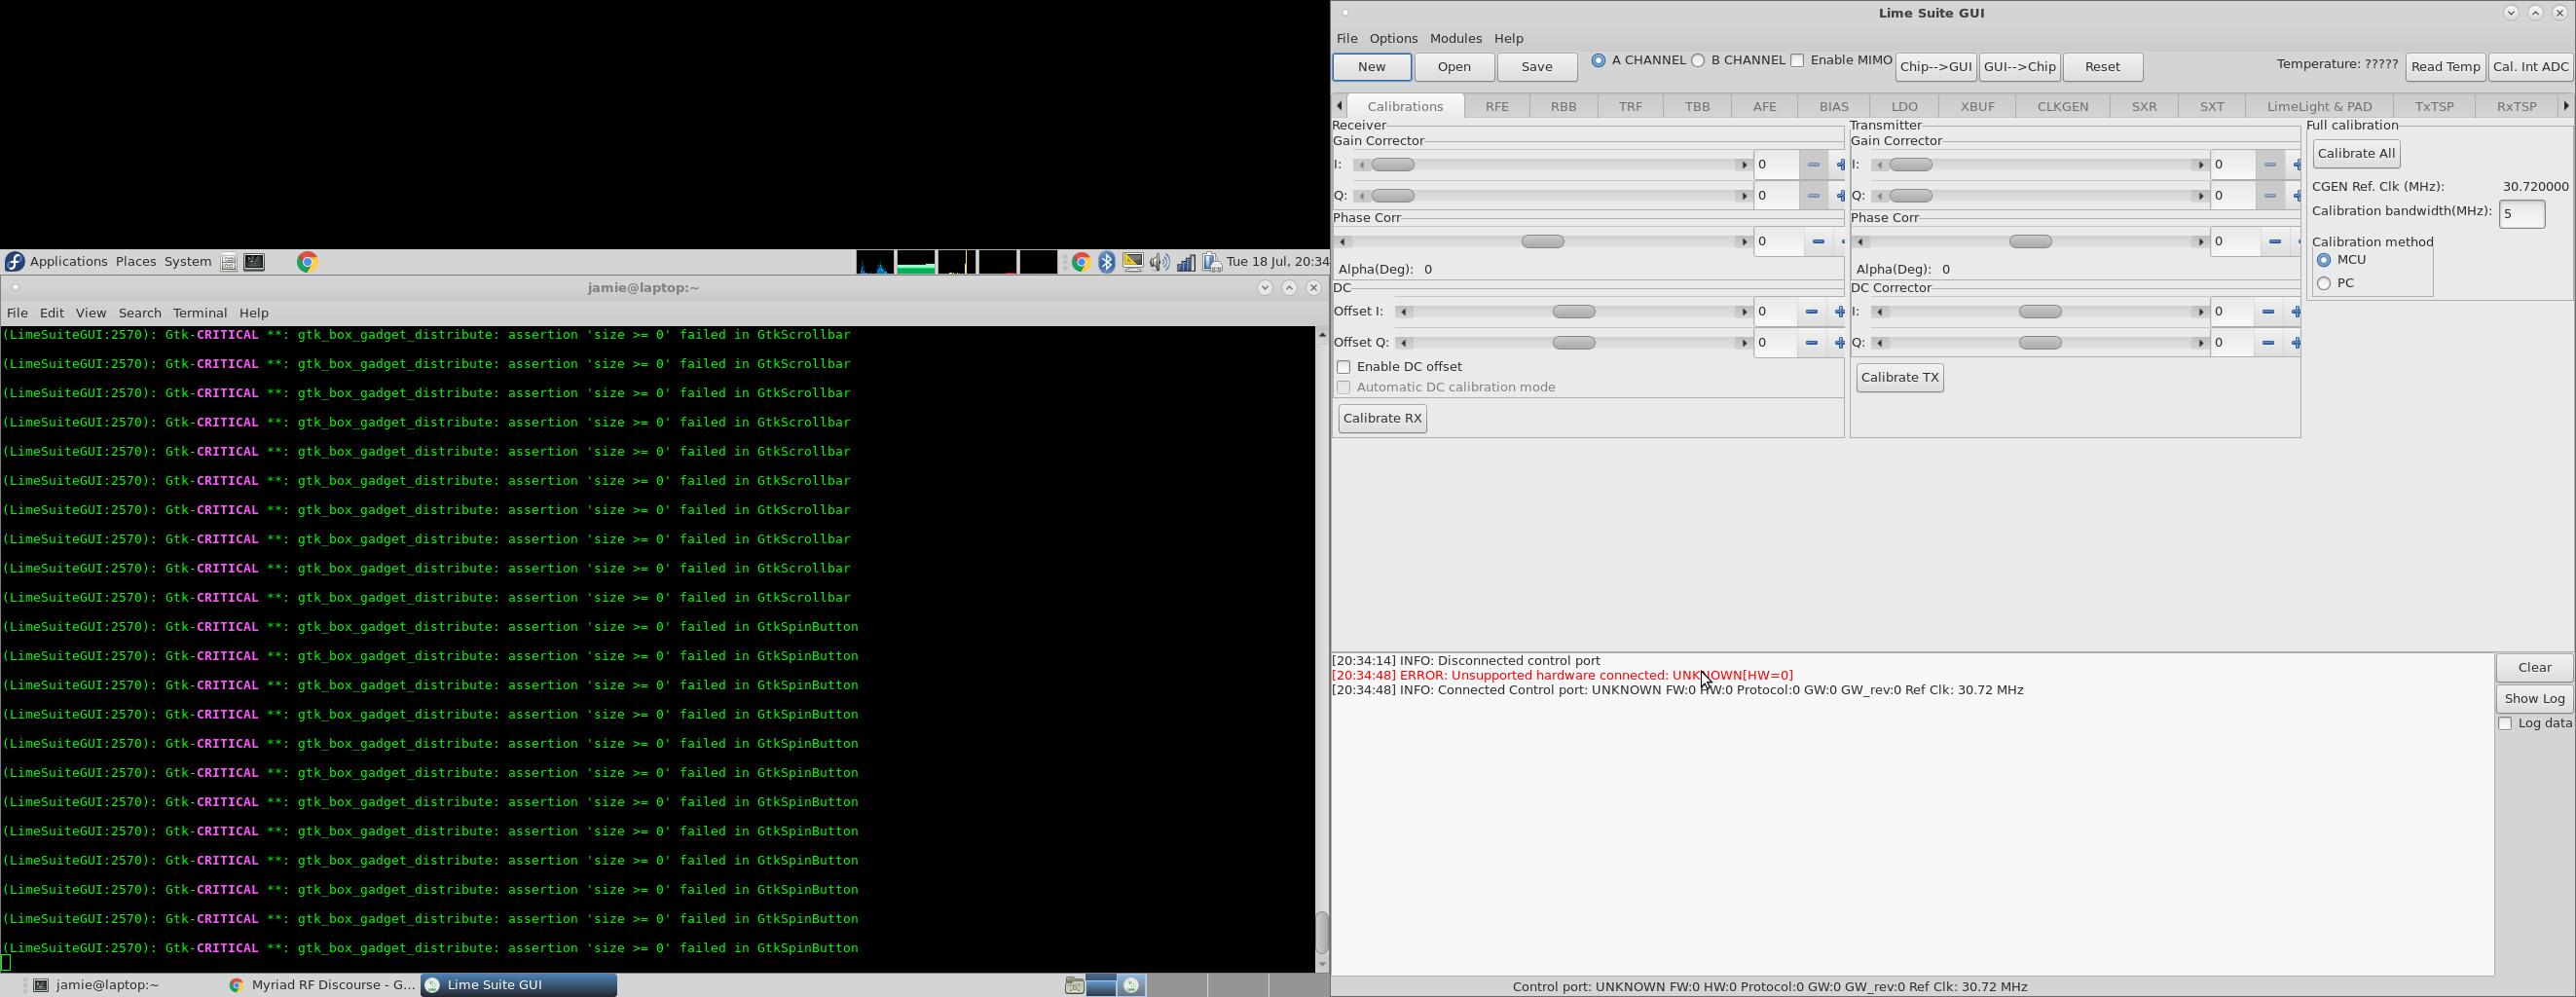 Limesdr installation issues - LimeSDR - Myriad RF Discourse